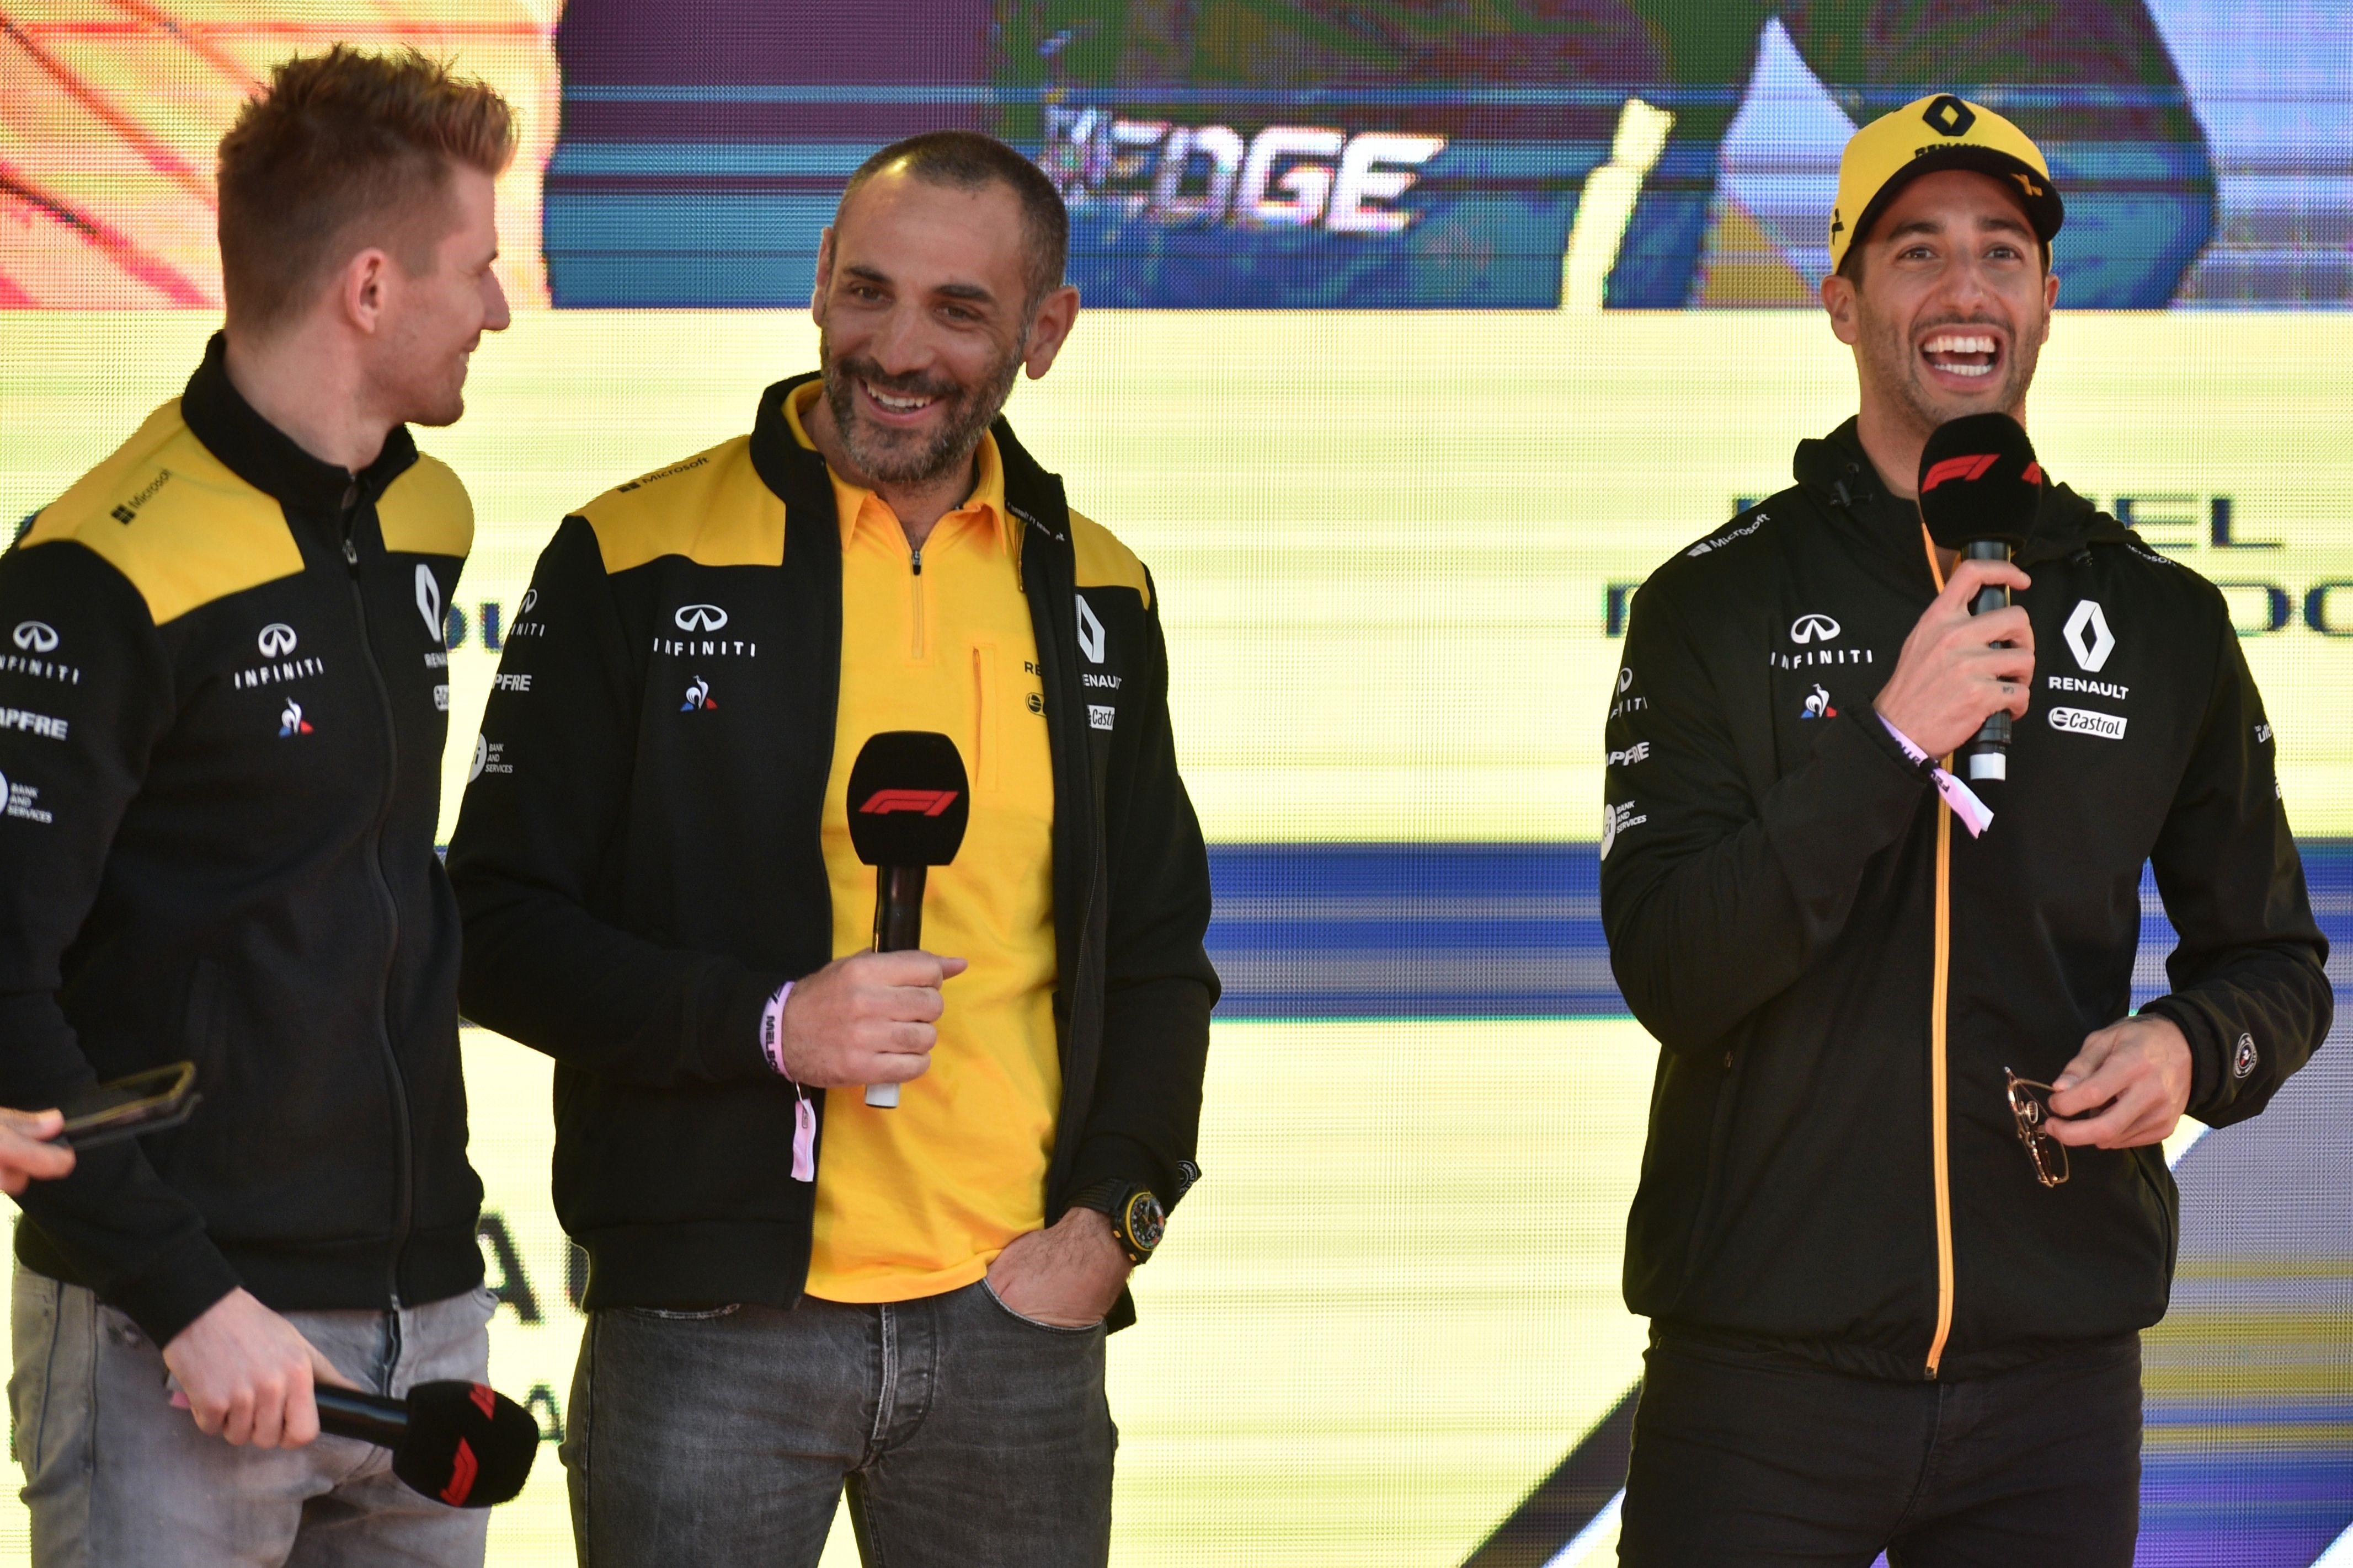 Nico Hülkenberg, Cyril Abiteboul et Daniel Ricciardo (Renault) au Grand Prix d'Australie 2019